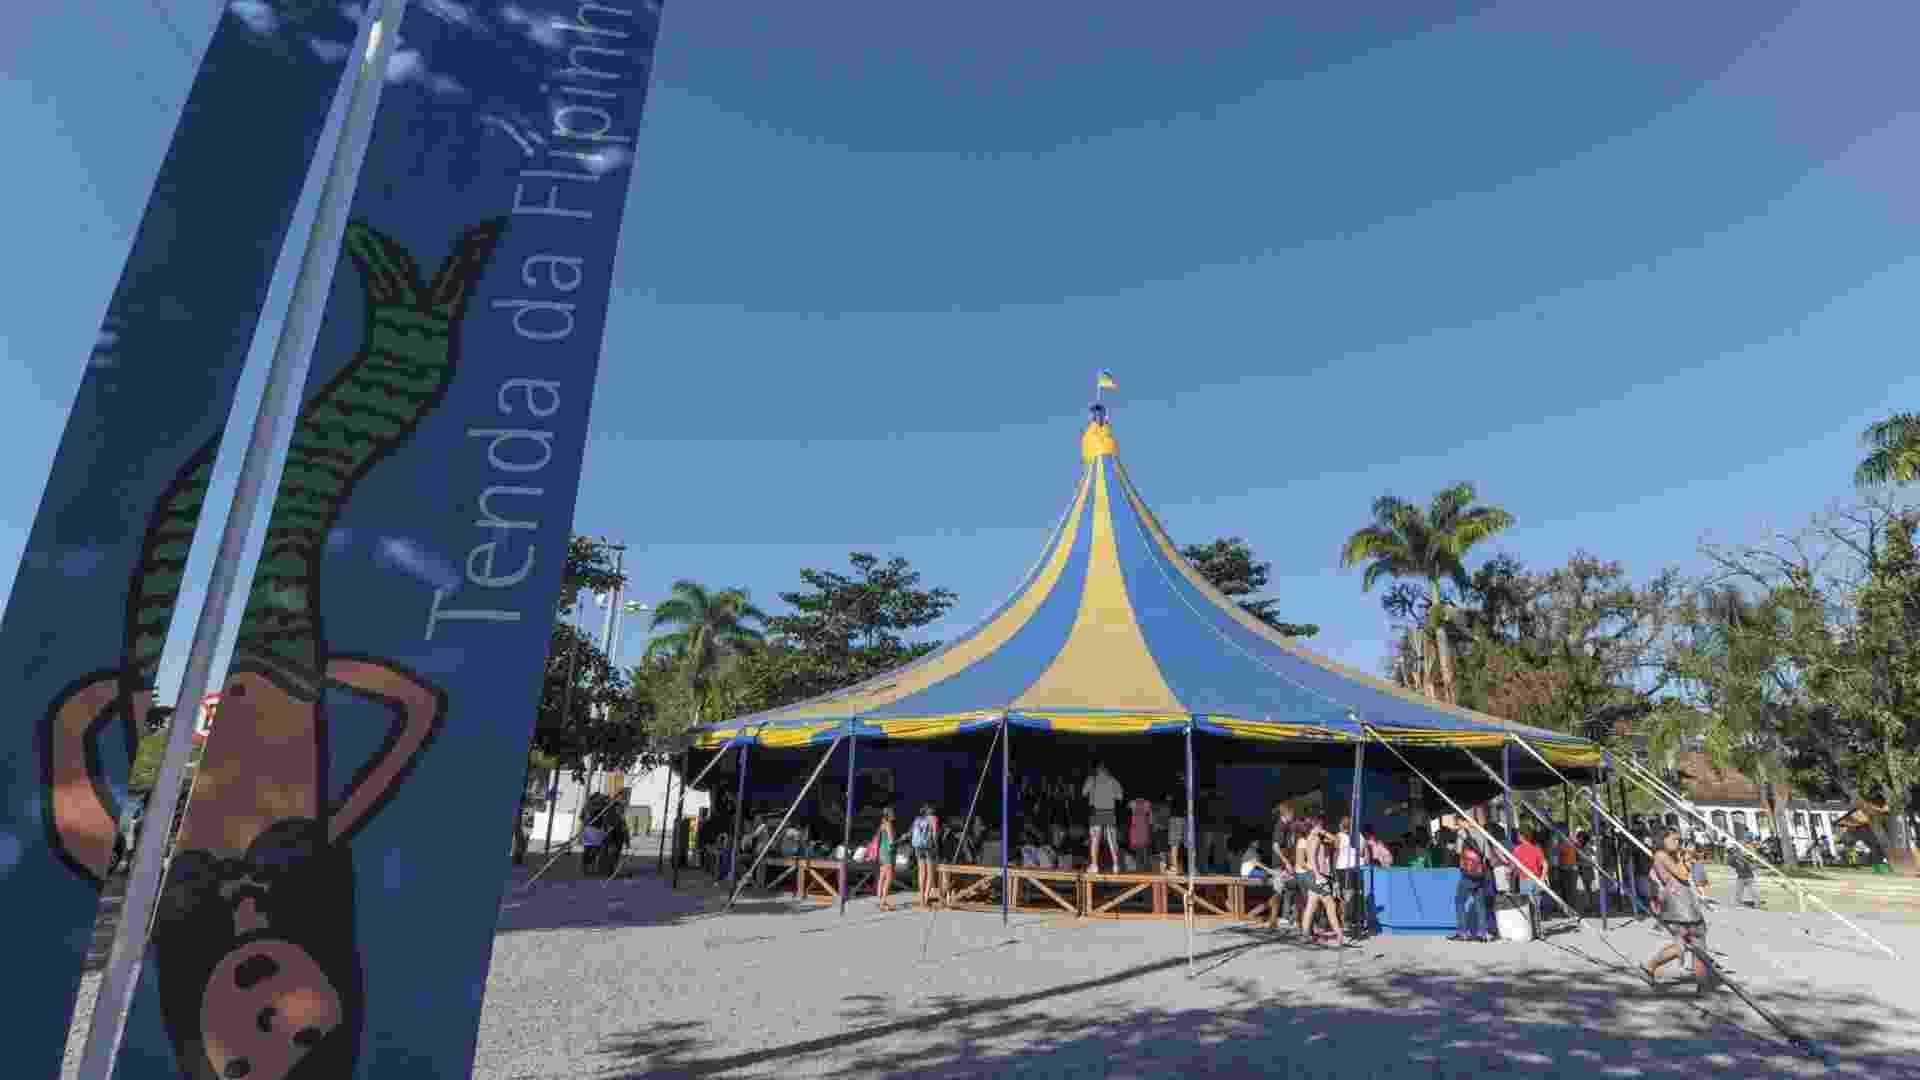 Tenda da Flipinha durante Flip 2012 em Parati (4/7/12) - Flavio Moraes/Fotoarena